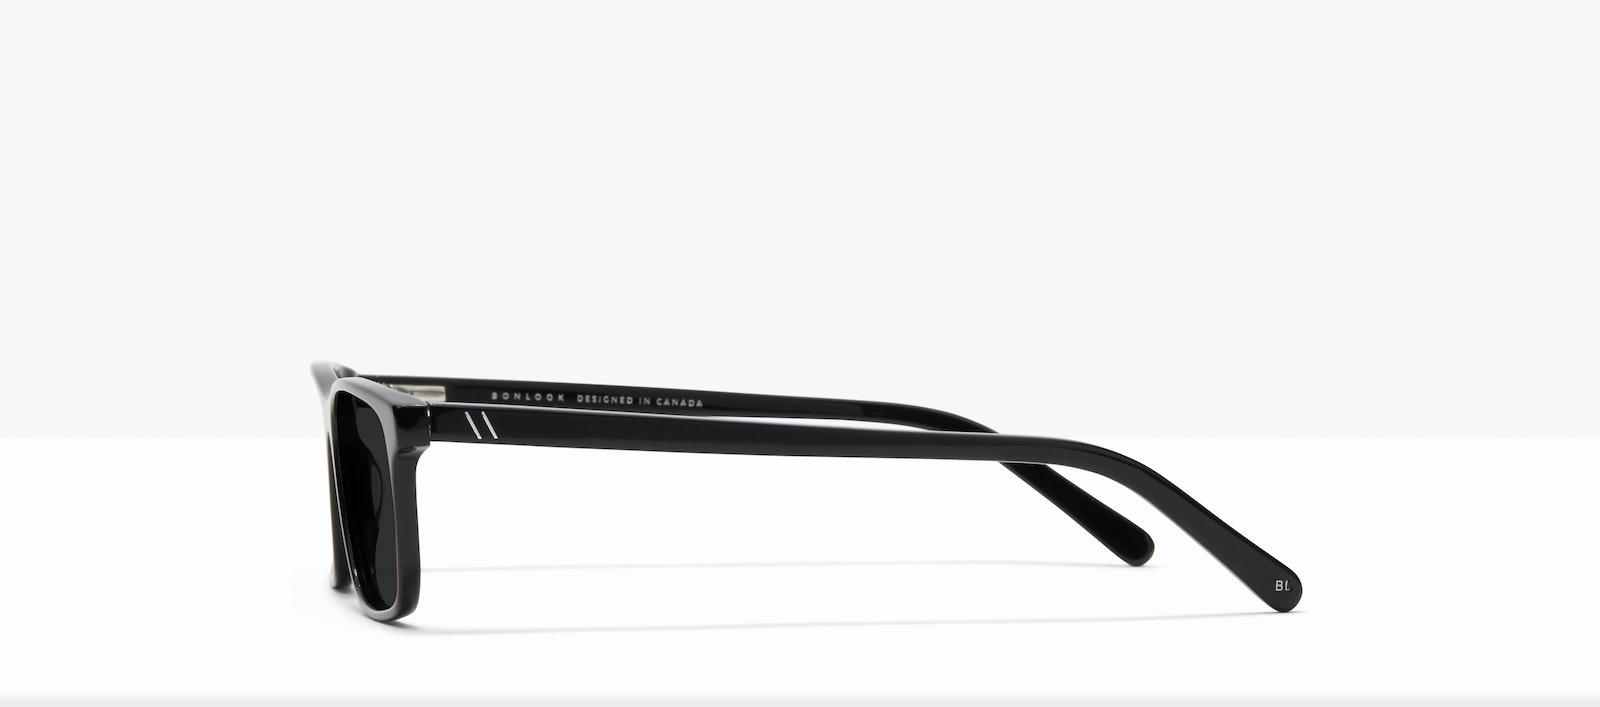 Affordable Fashion Glasses Rectangle Sunglasses Men Henri XL Black Side